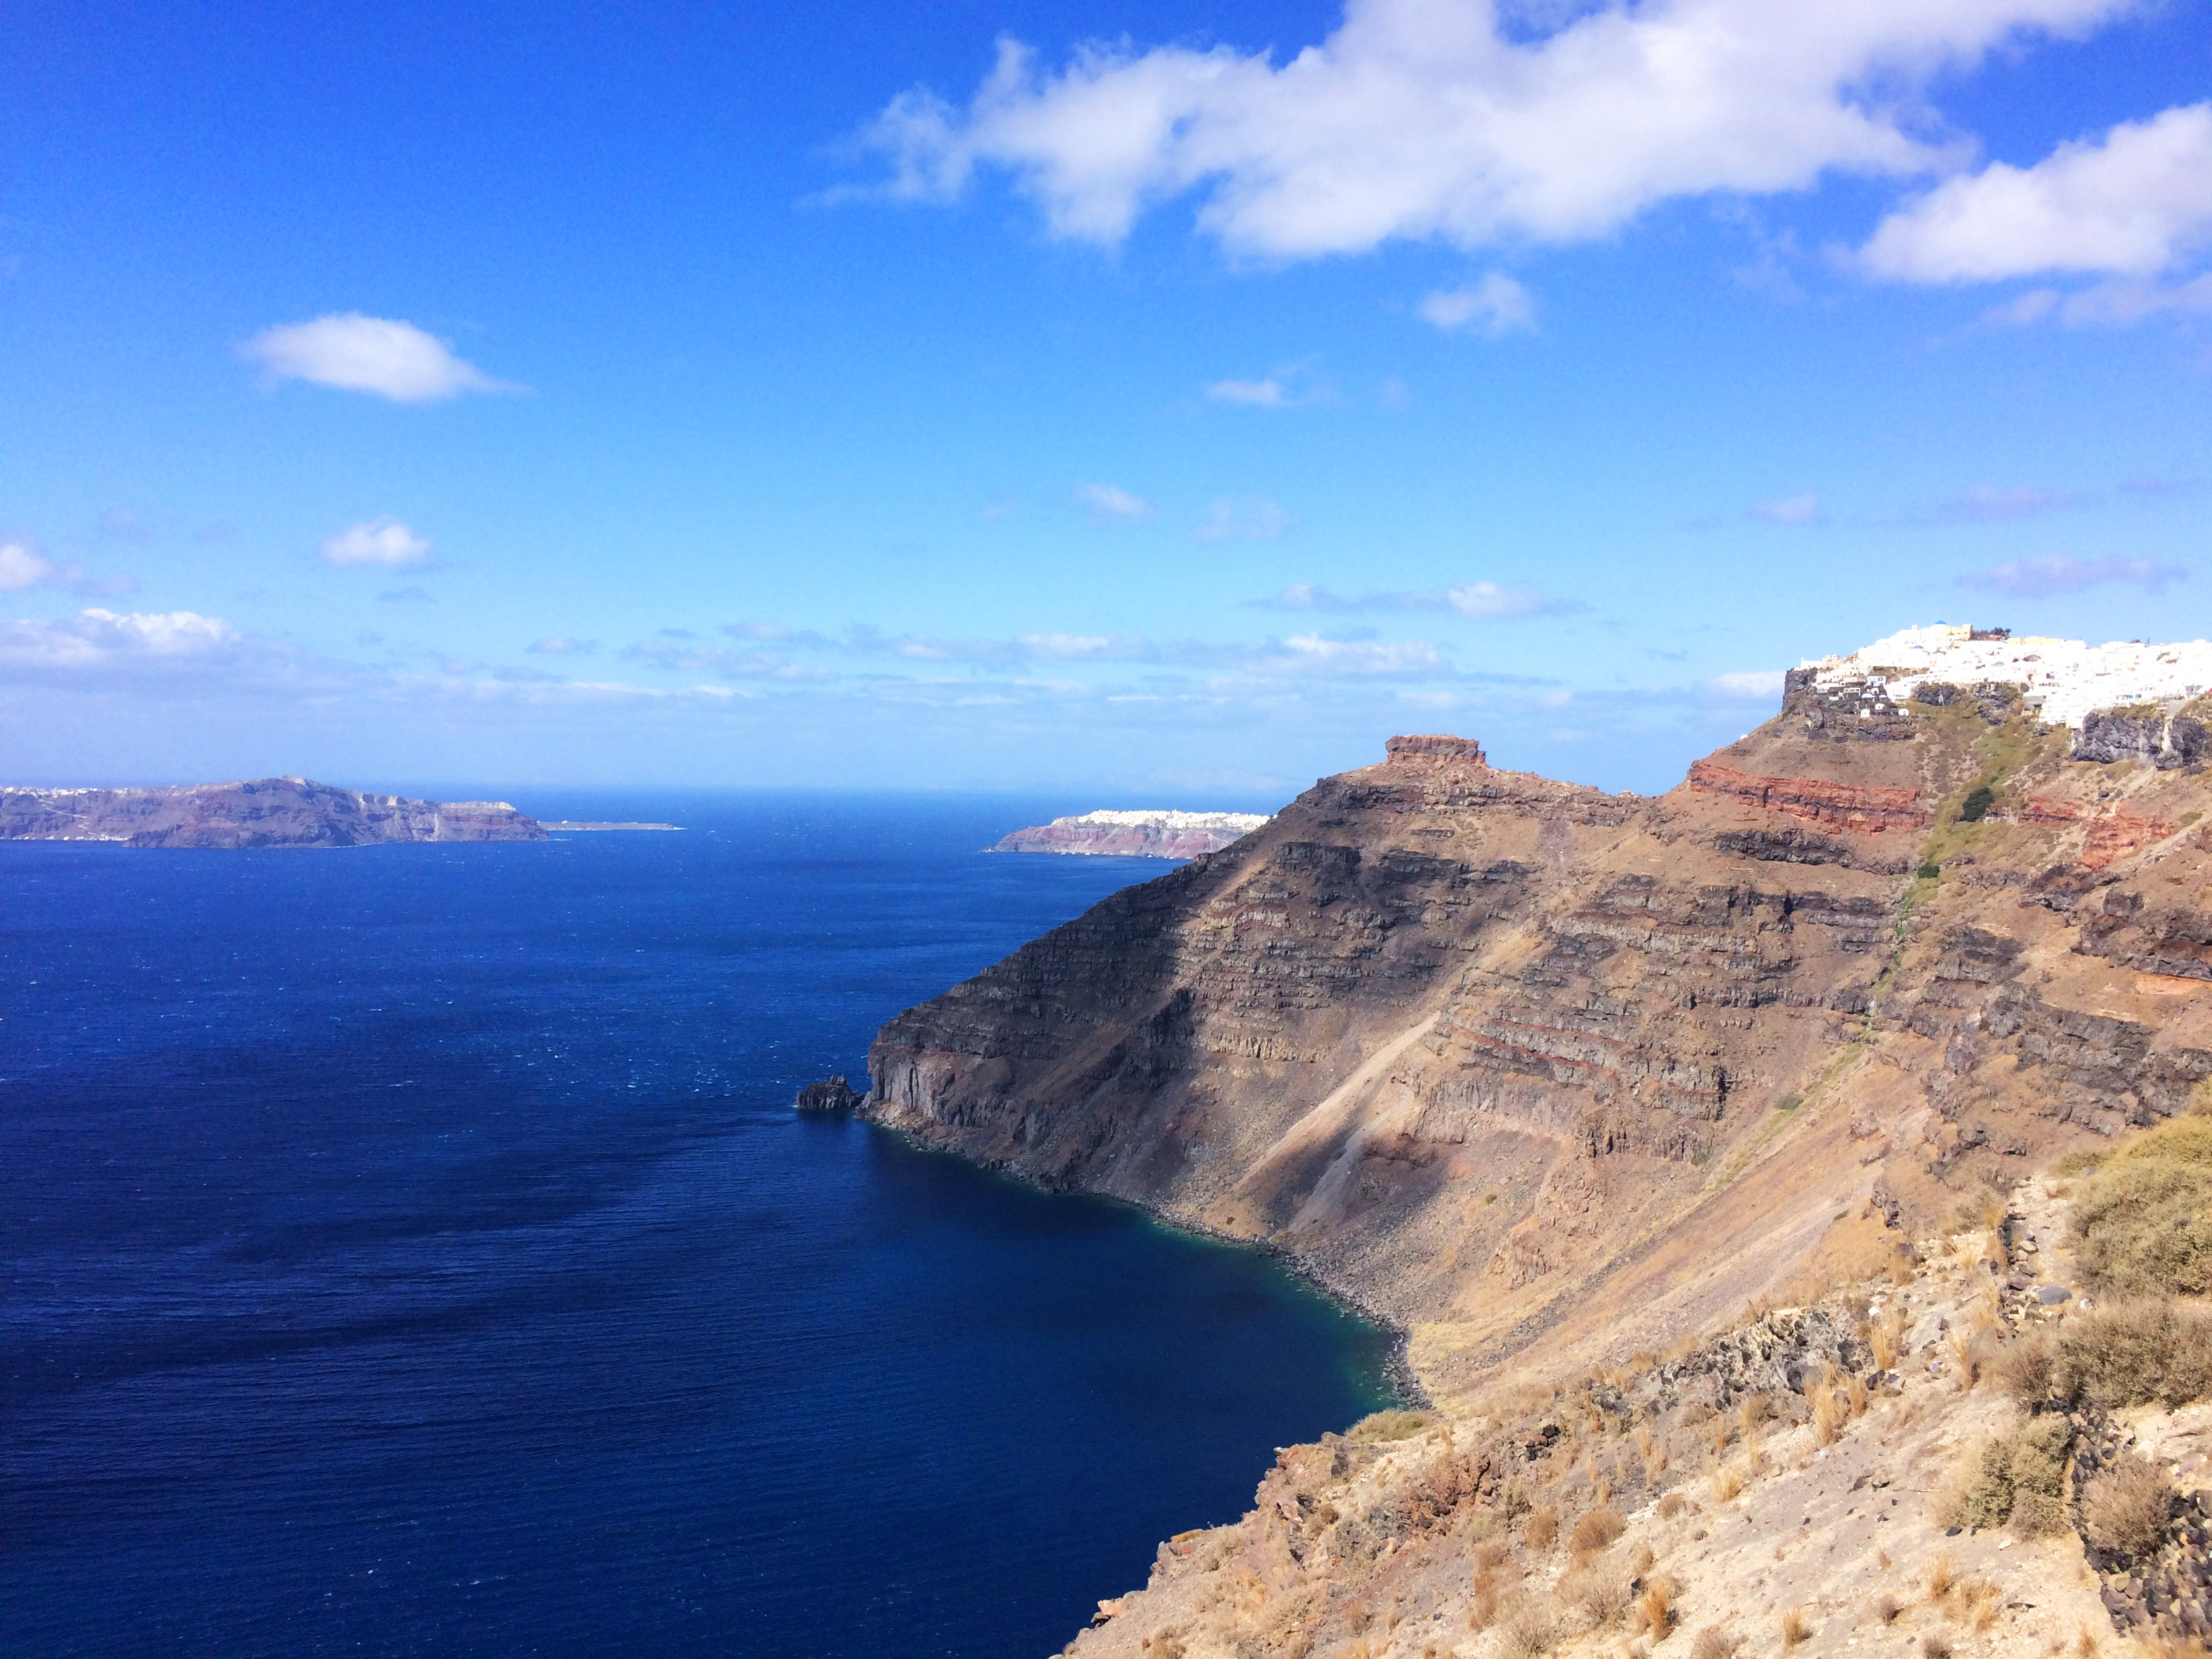 obala otok Santorini Grčka pejzaž